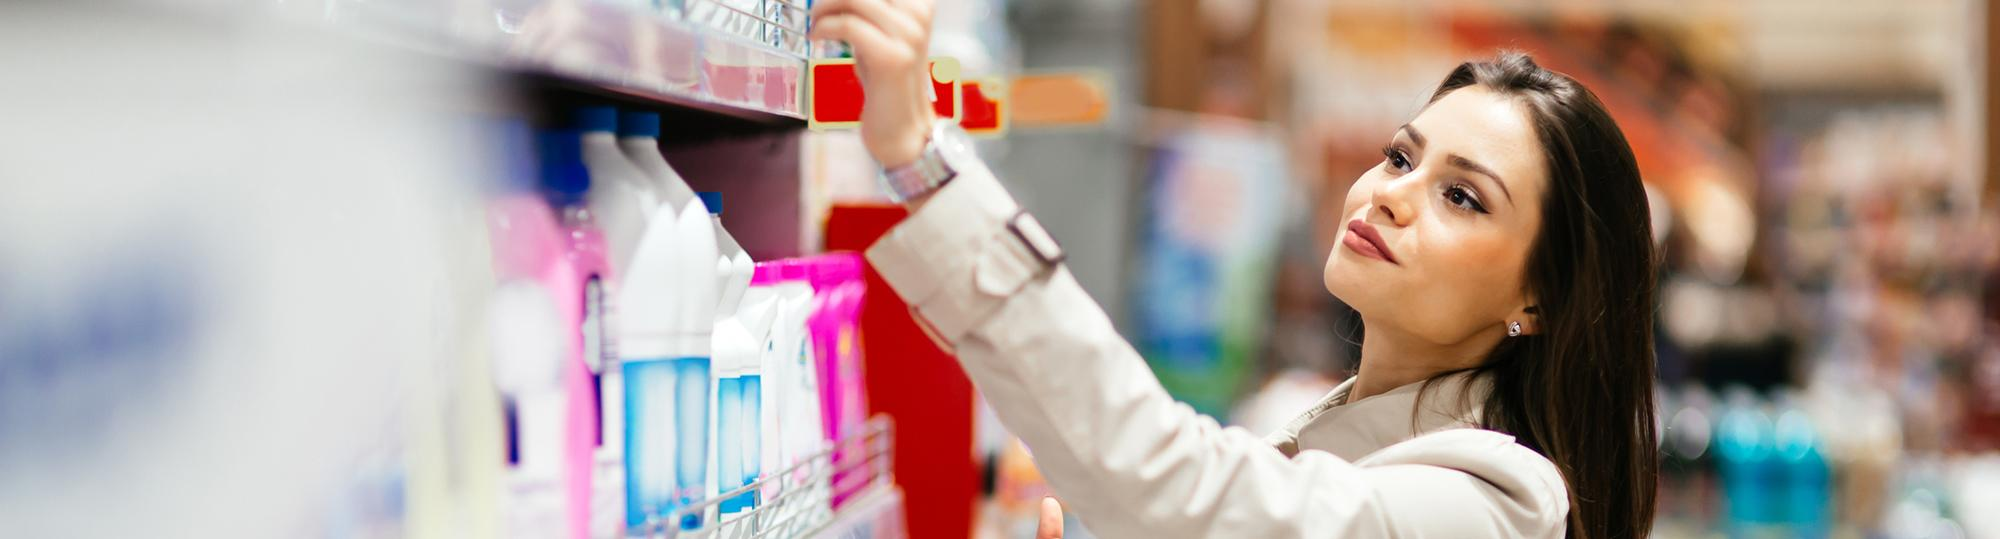 cvs deal hero woman shopping at pharmacy